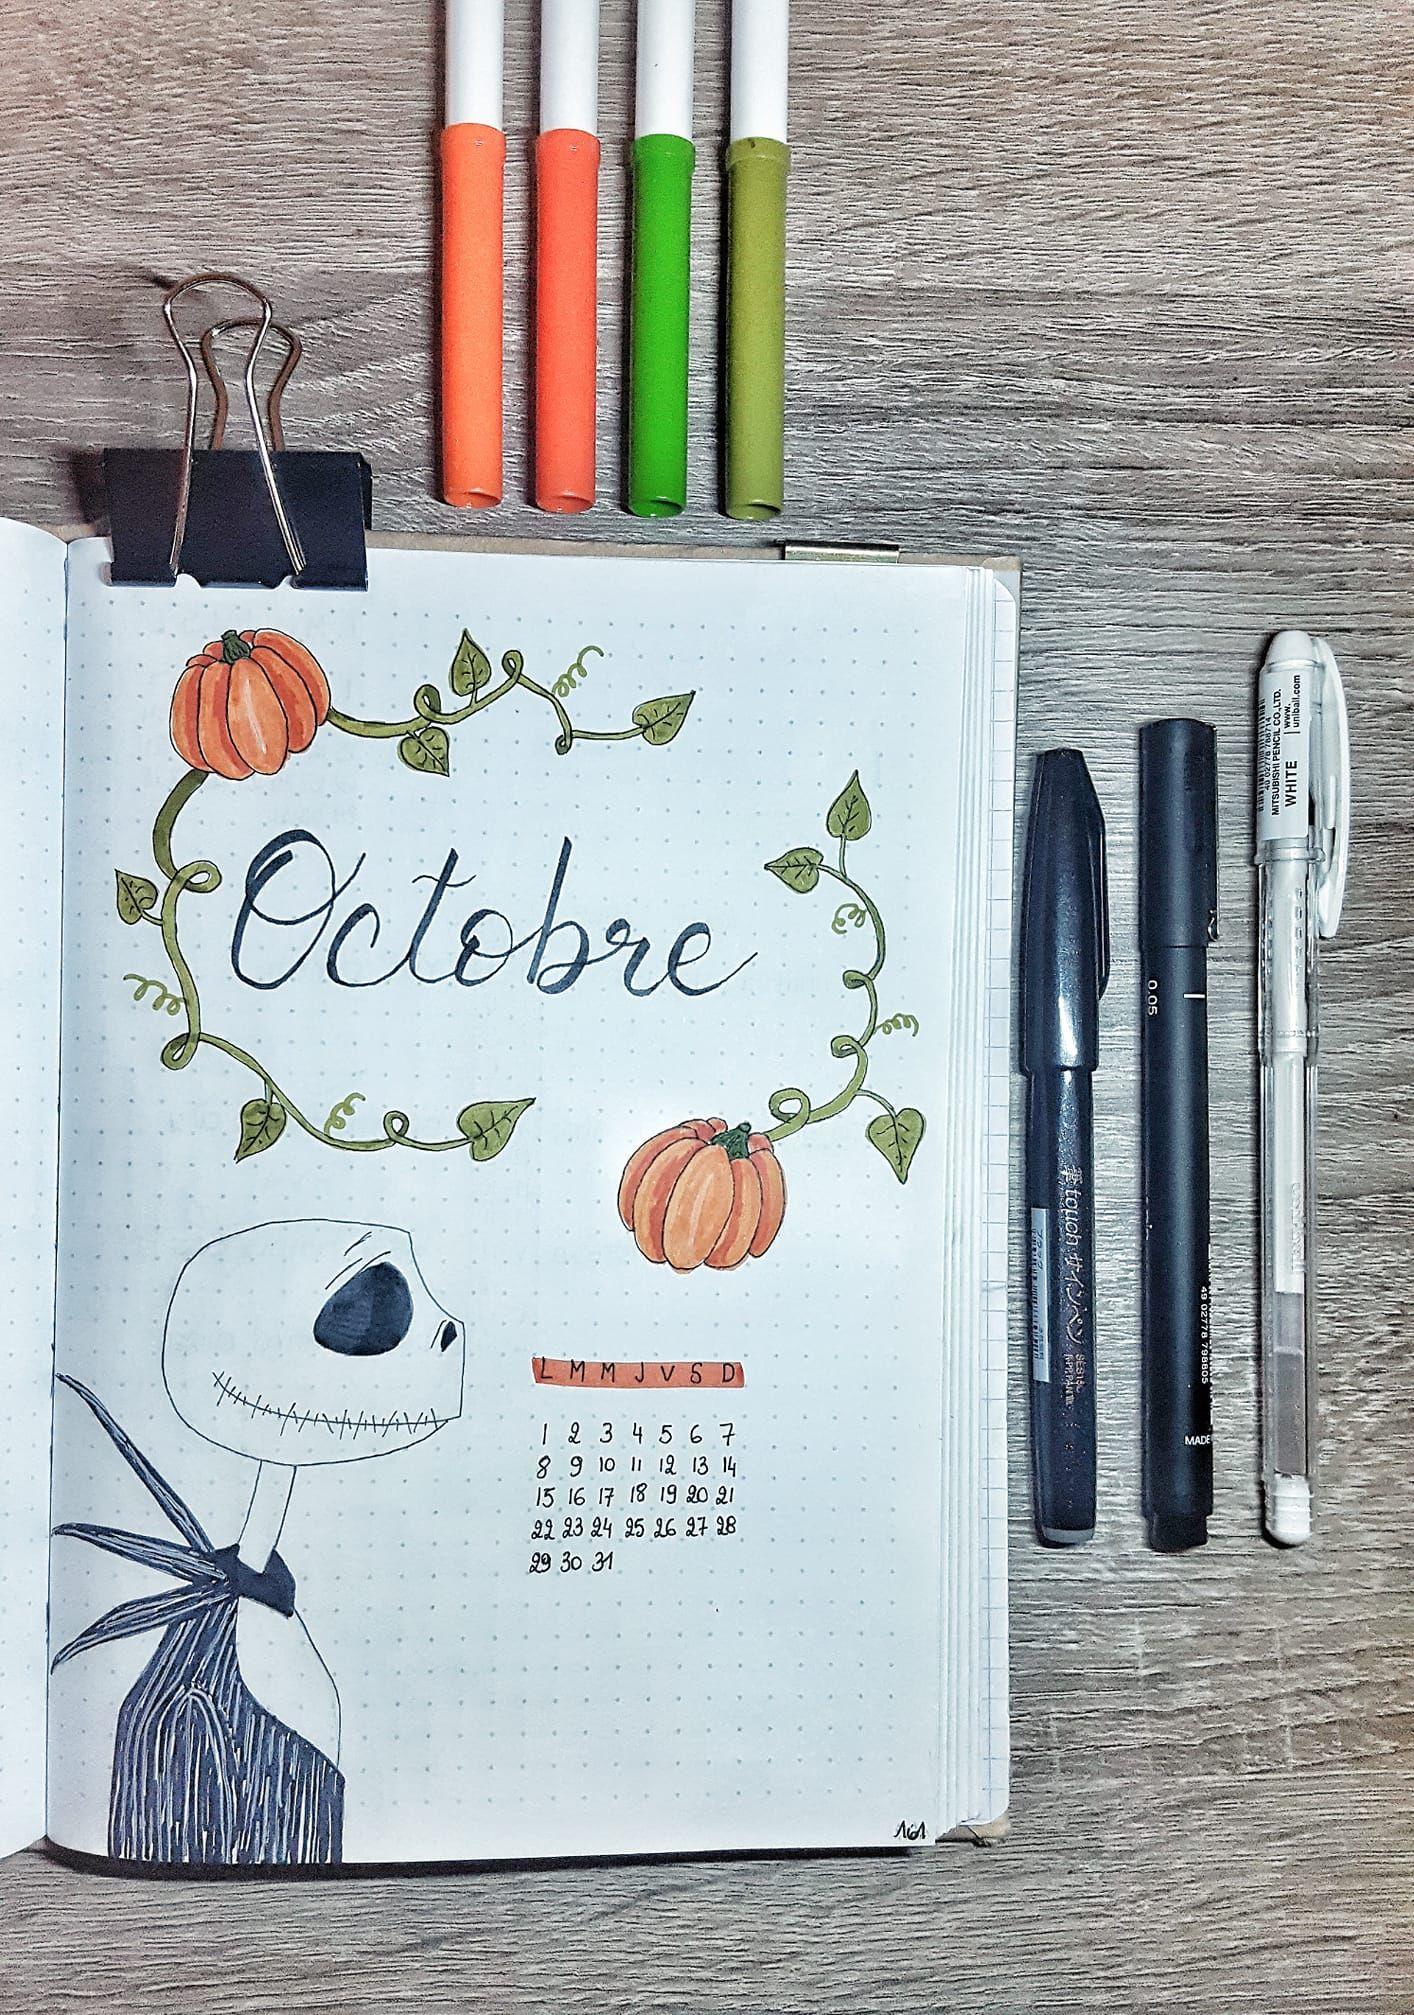 Mon Bullet journal - Mon Bujo - Mois d'octobre thème citrouille et halloween. Mr Jack inspiration Pinterest. Instagram : @Milimagination #bulletjournaloctobre